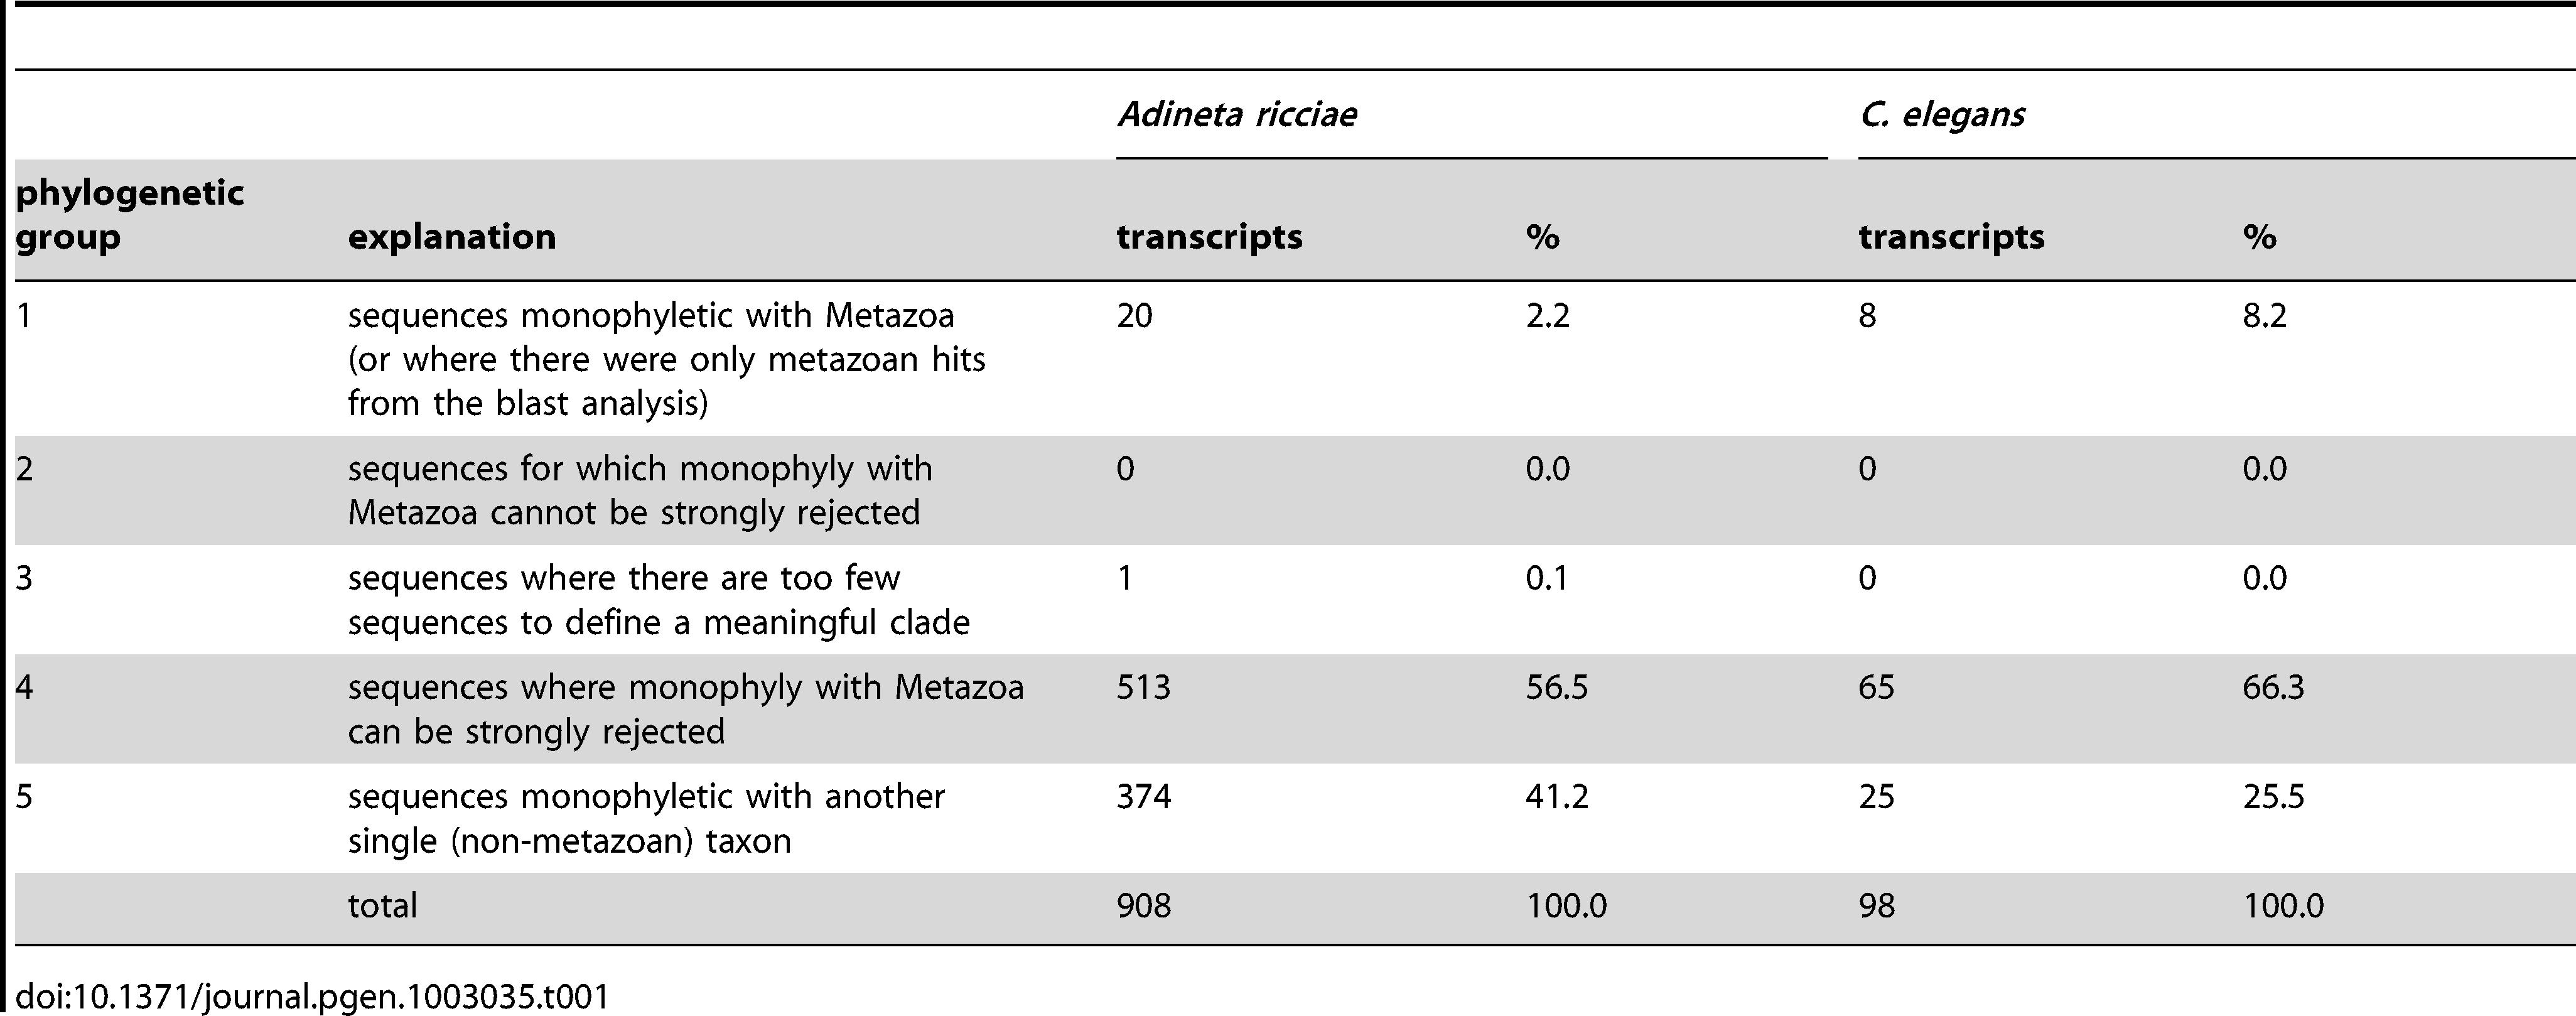 Summary of phylogenetic assignments for <i>A. ricciae</i> and <i>C. elegans</i>.